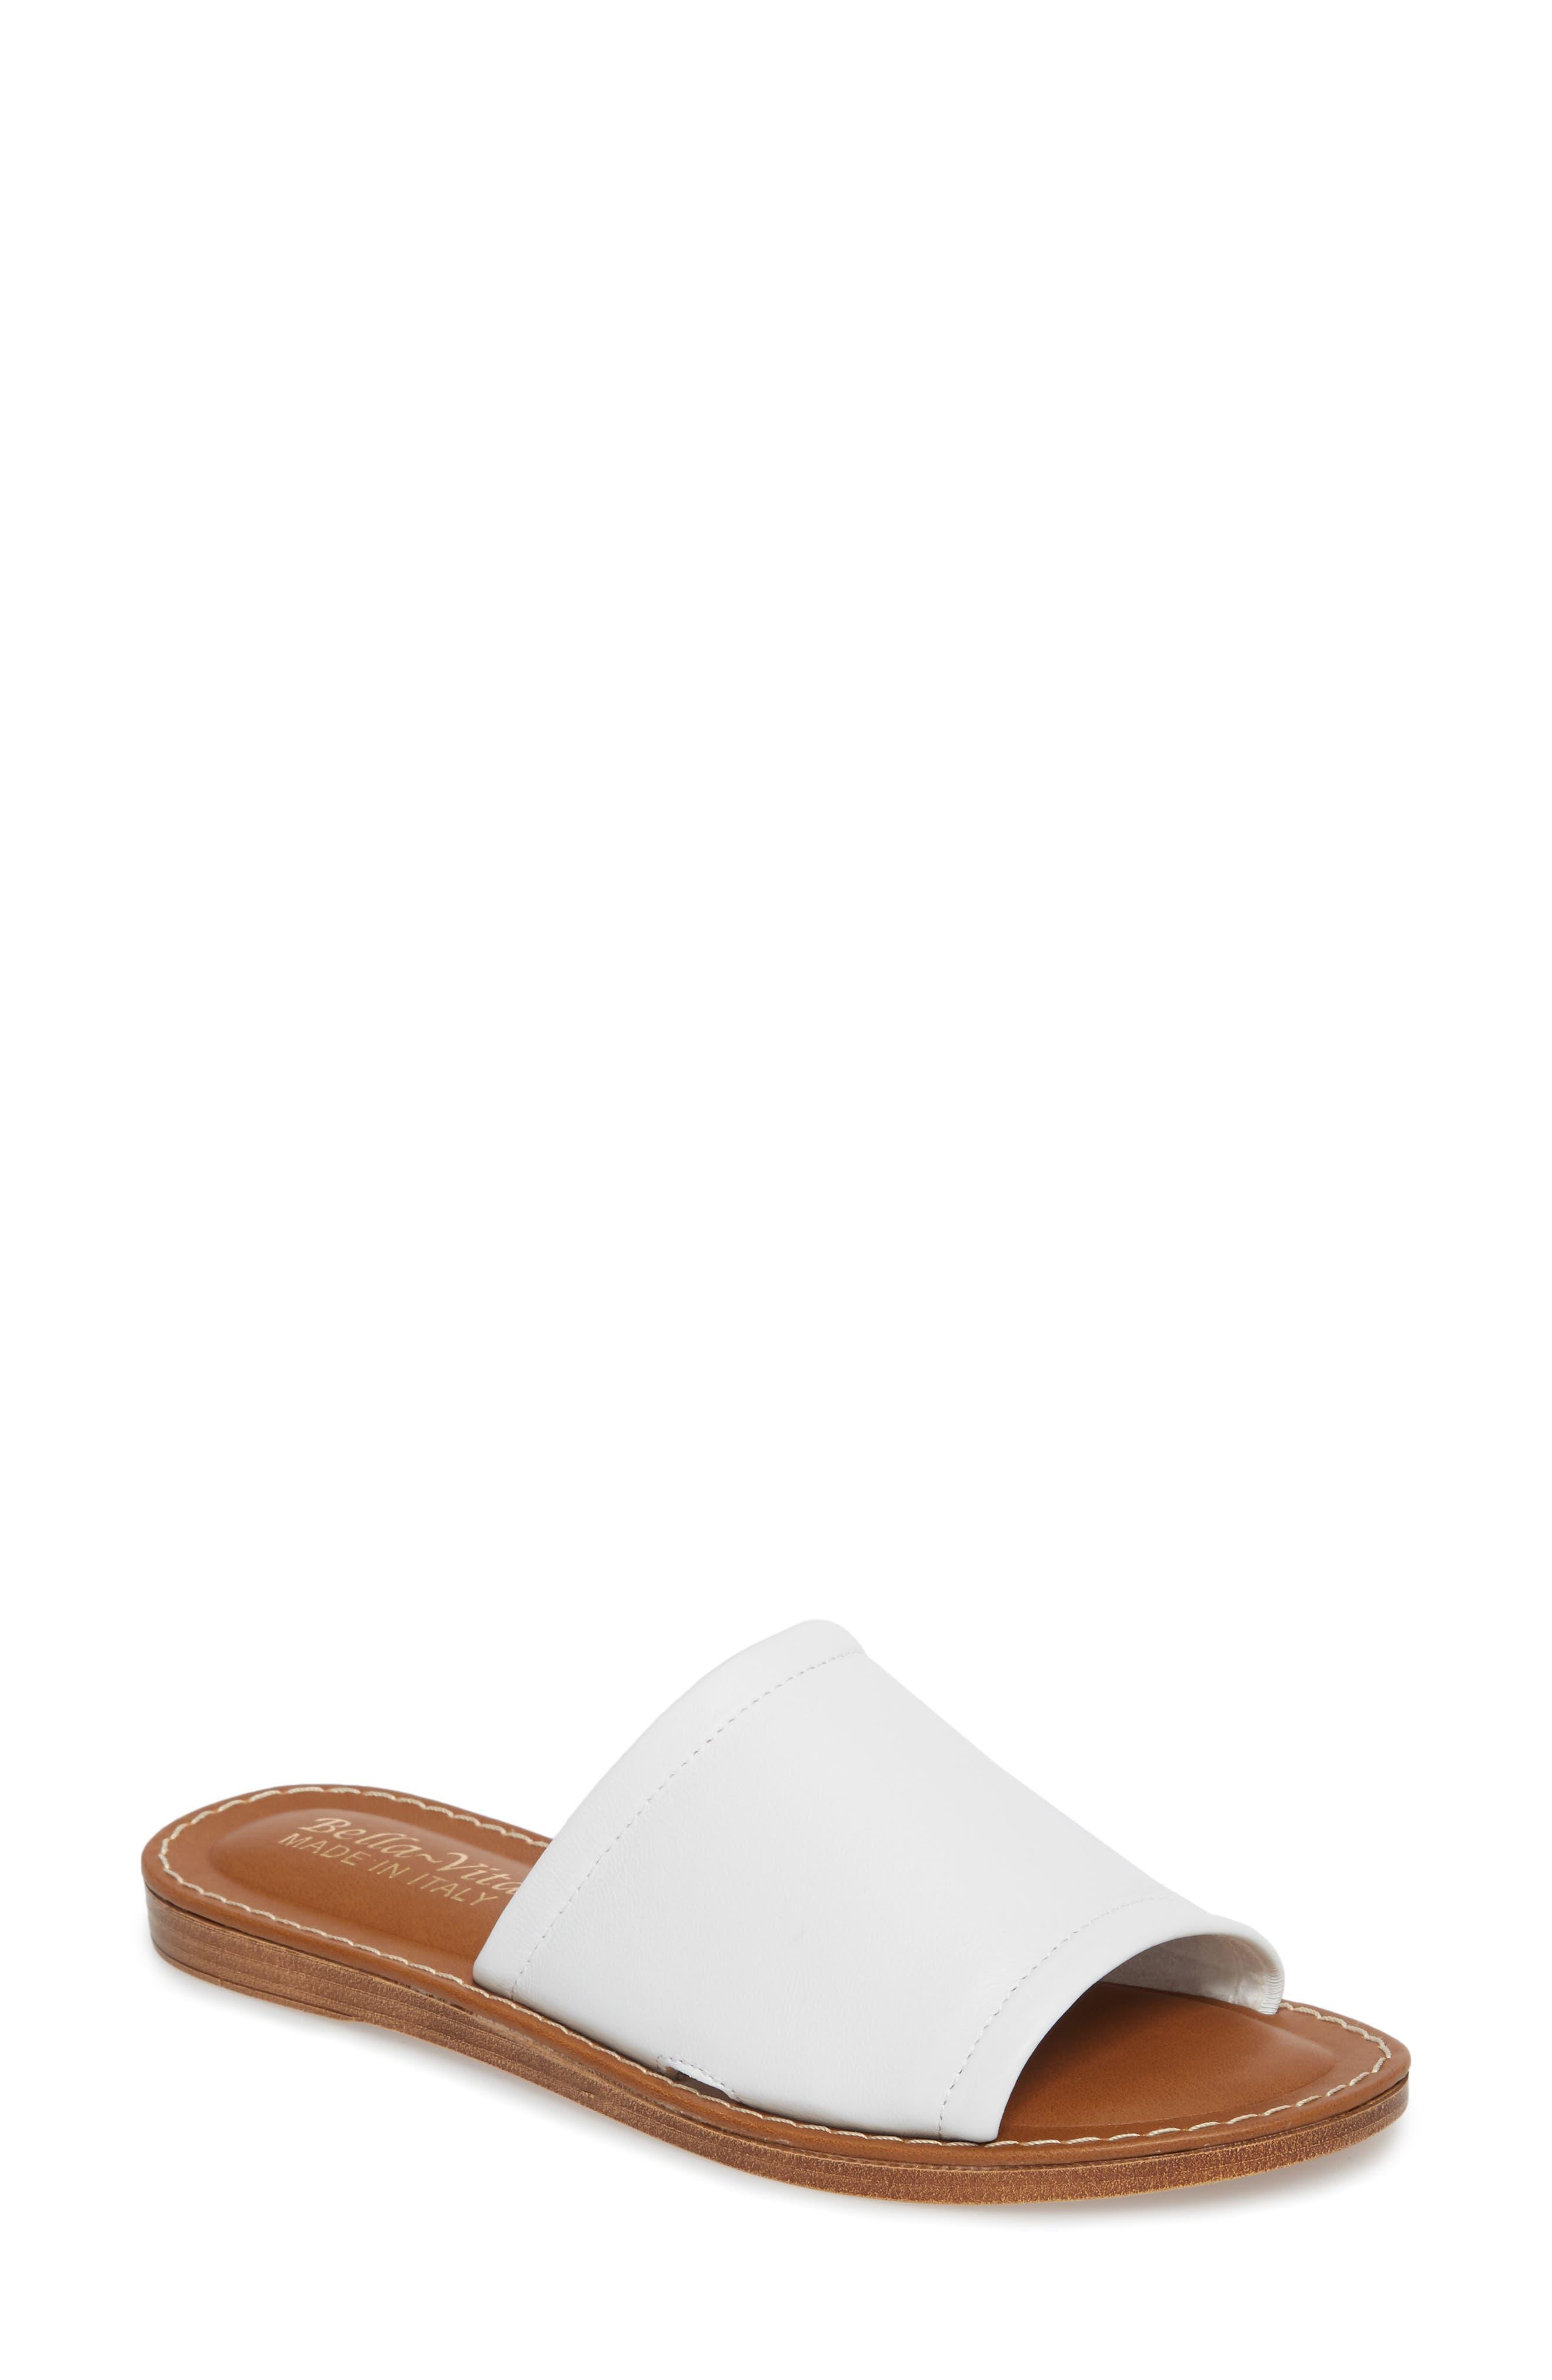 Women's White Mules \u0026 Slides   Nordstrom